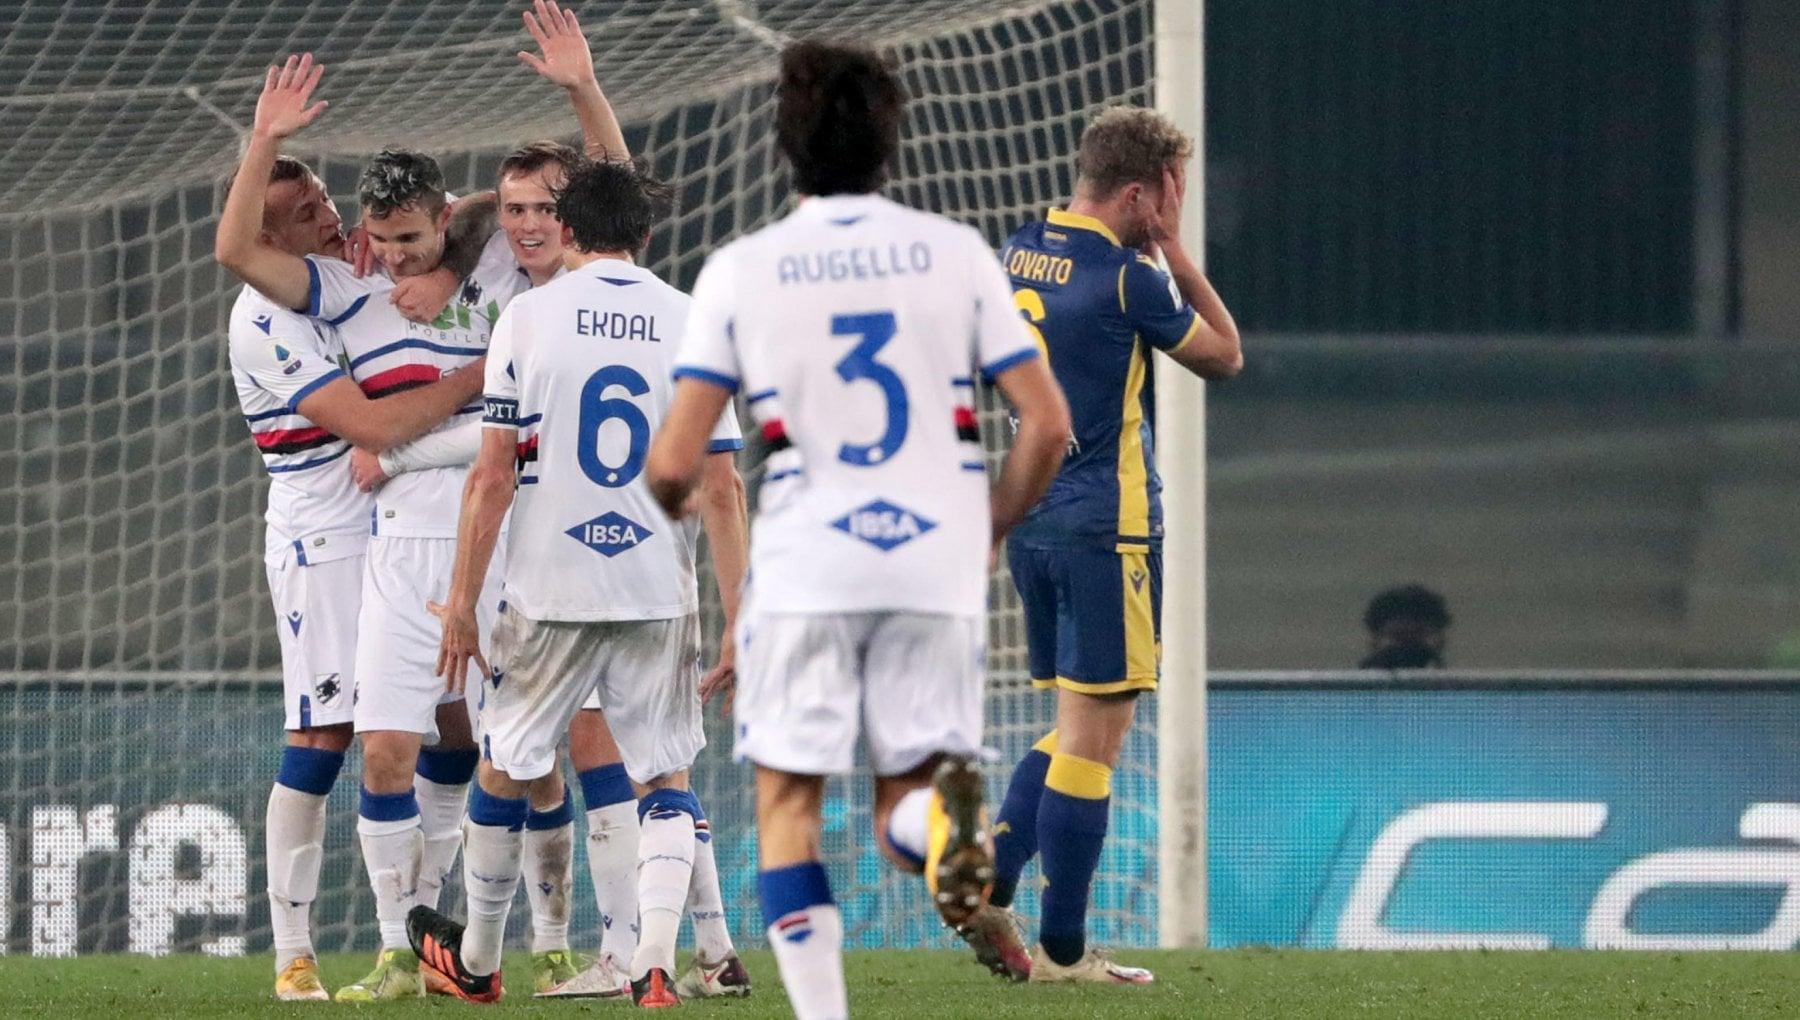 Verona Sampdoria 1 2 Ekdal e Verre rlanciano i doriani